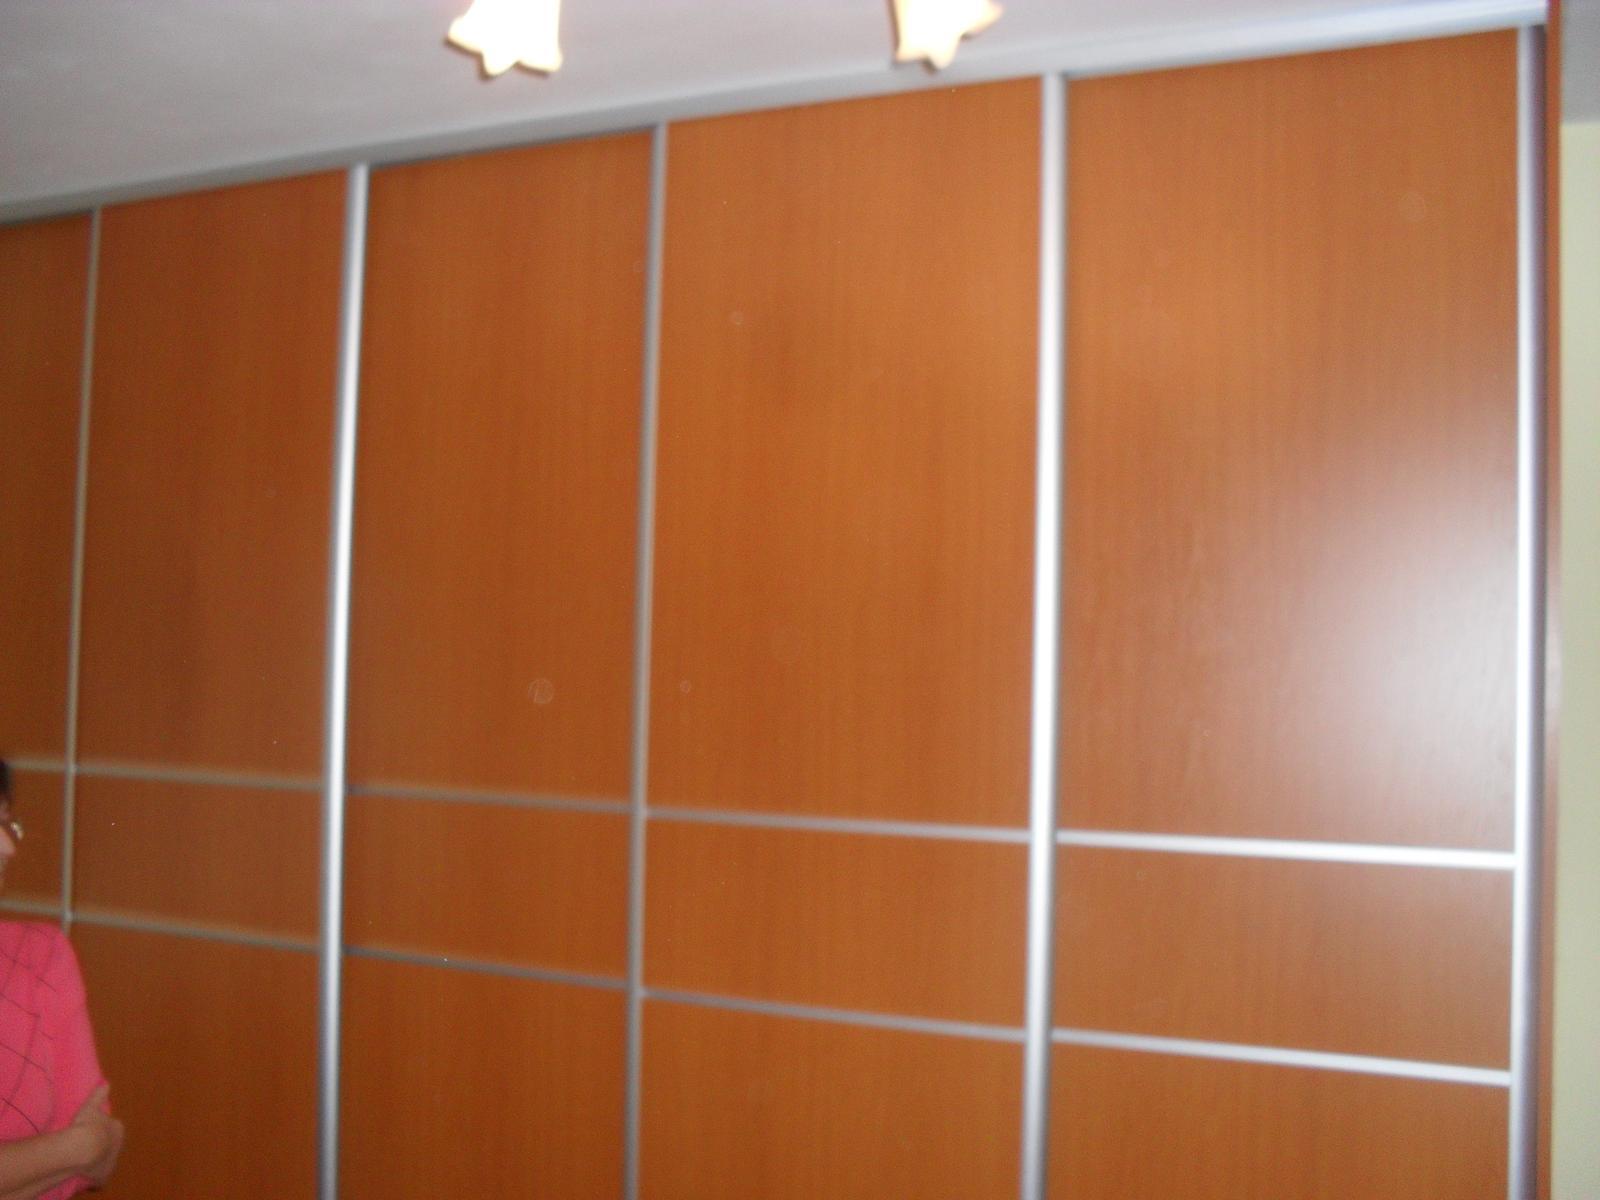 Vstavané skrine Martin Benko Bošany - Obrázok č. 76